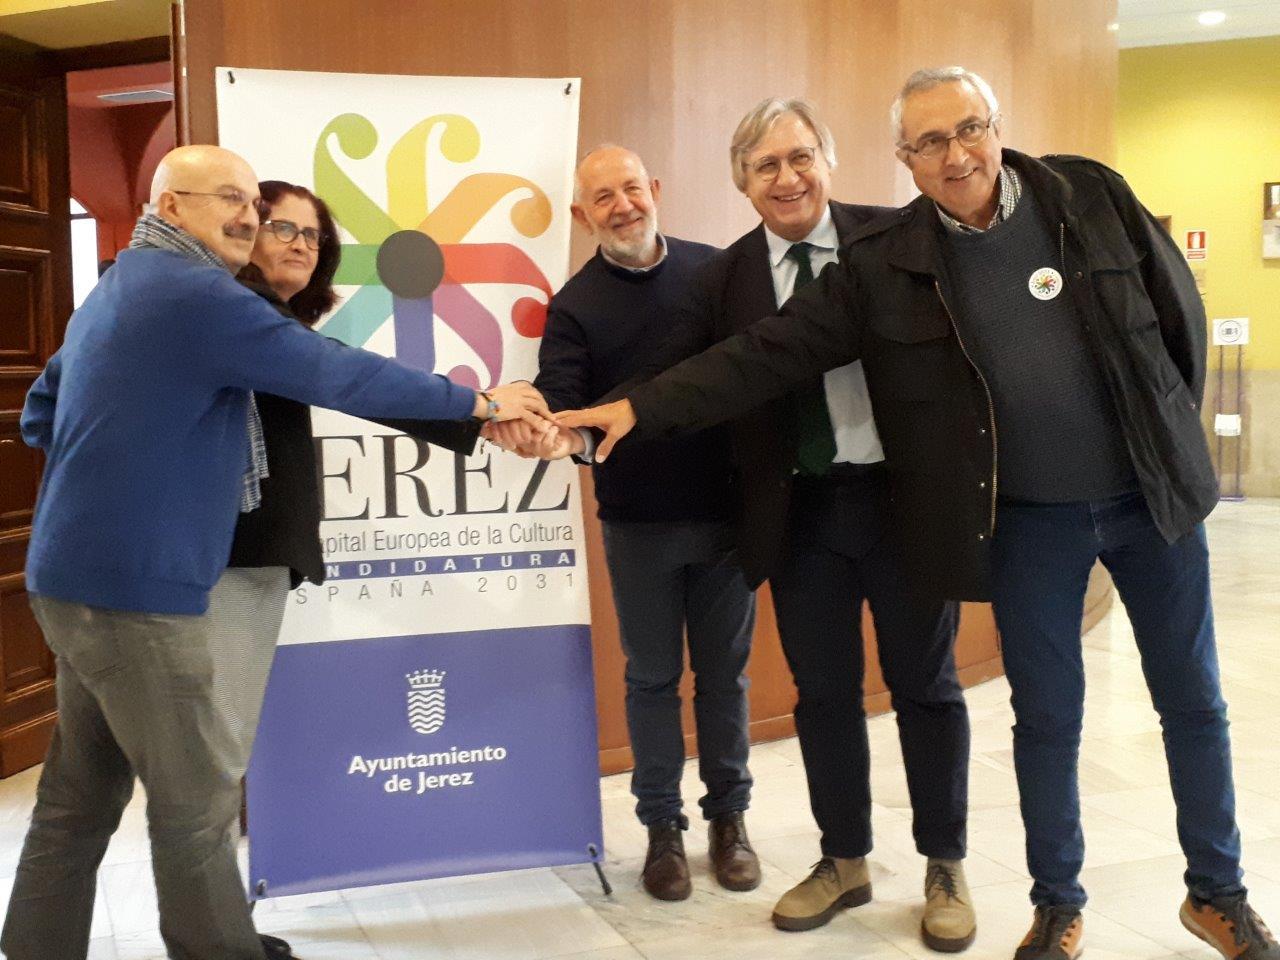 Jerez capitalidad sindicatos